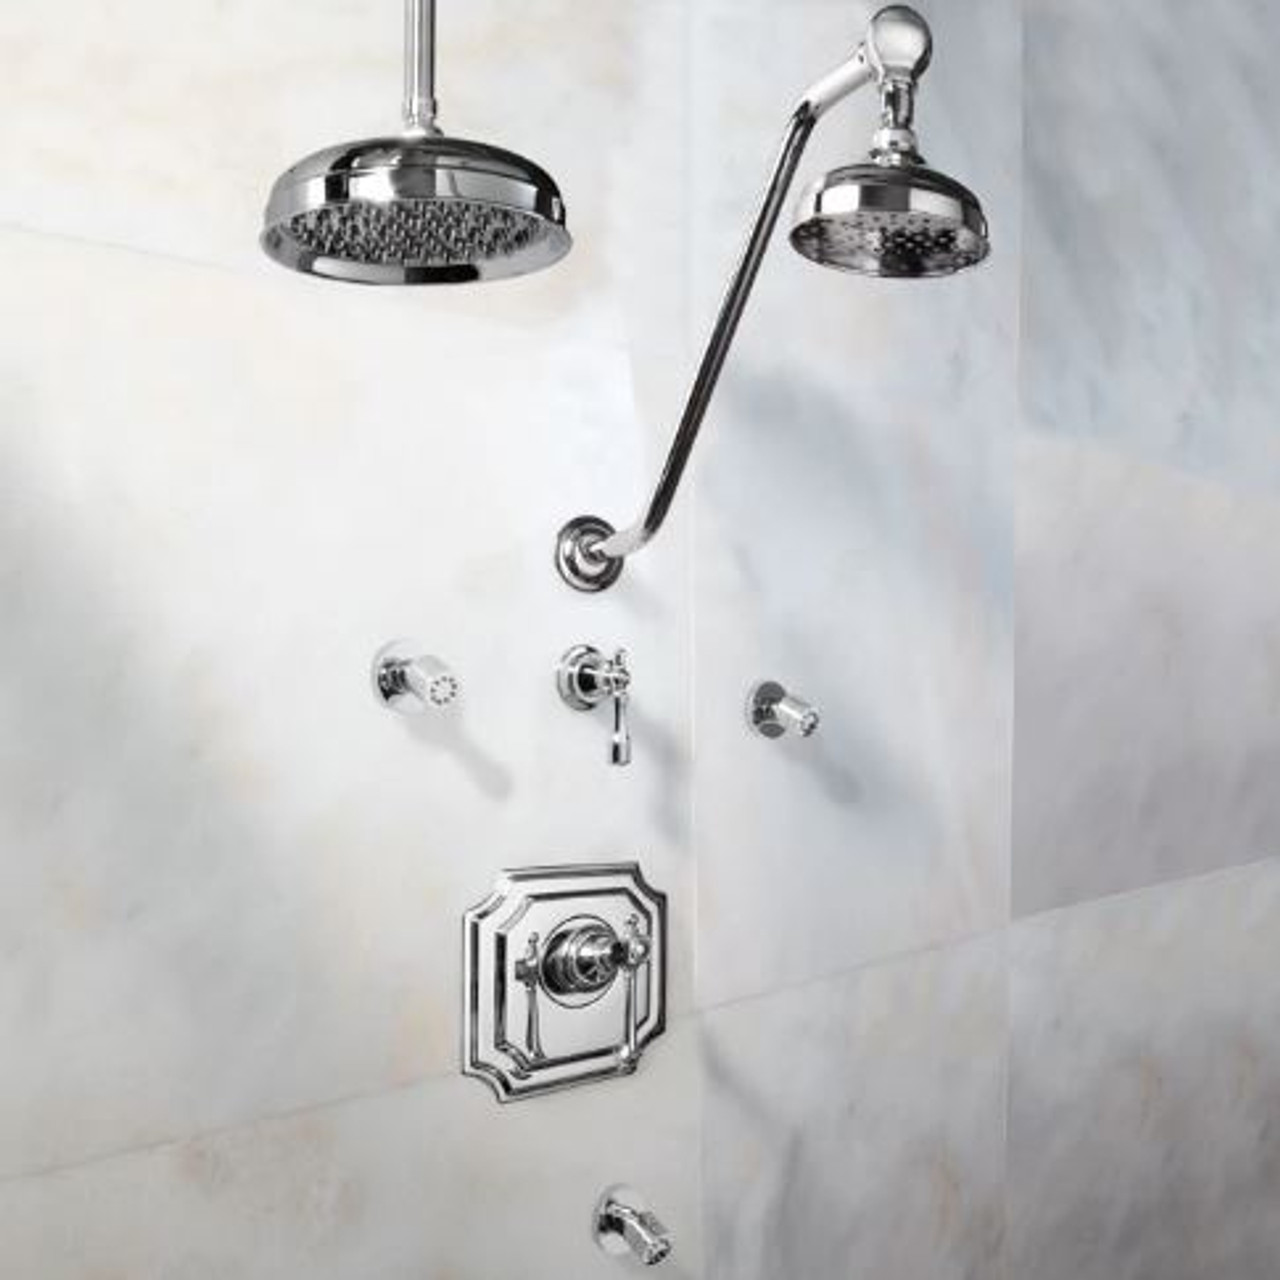 signature hardware vintage shower system 14 rain shower body sprays lever handles